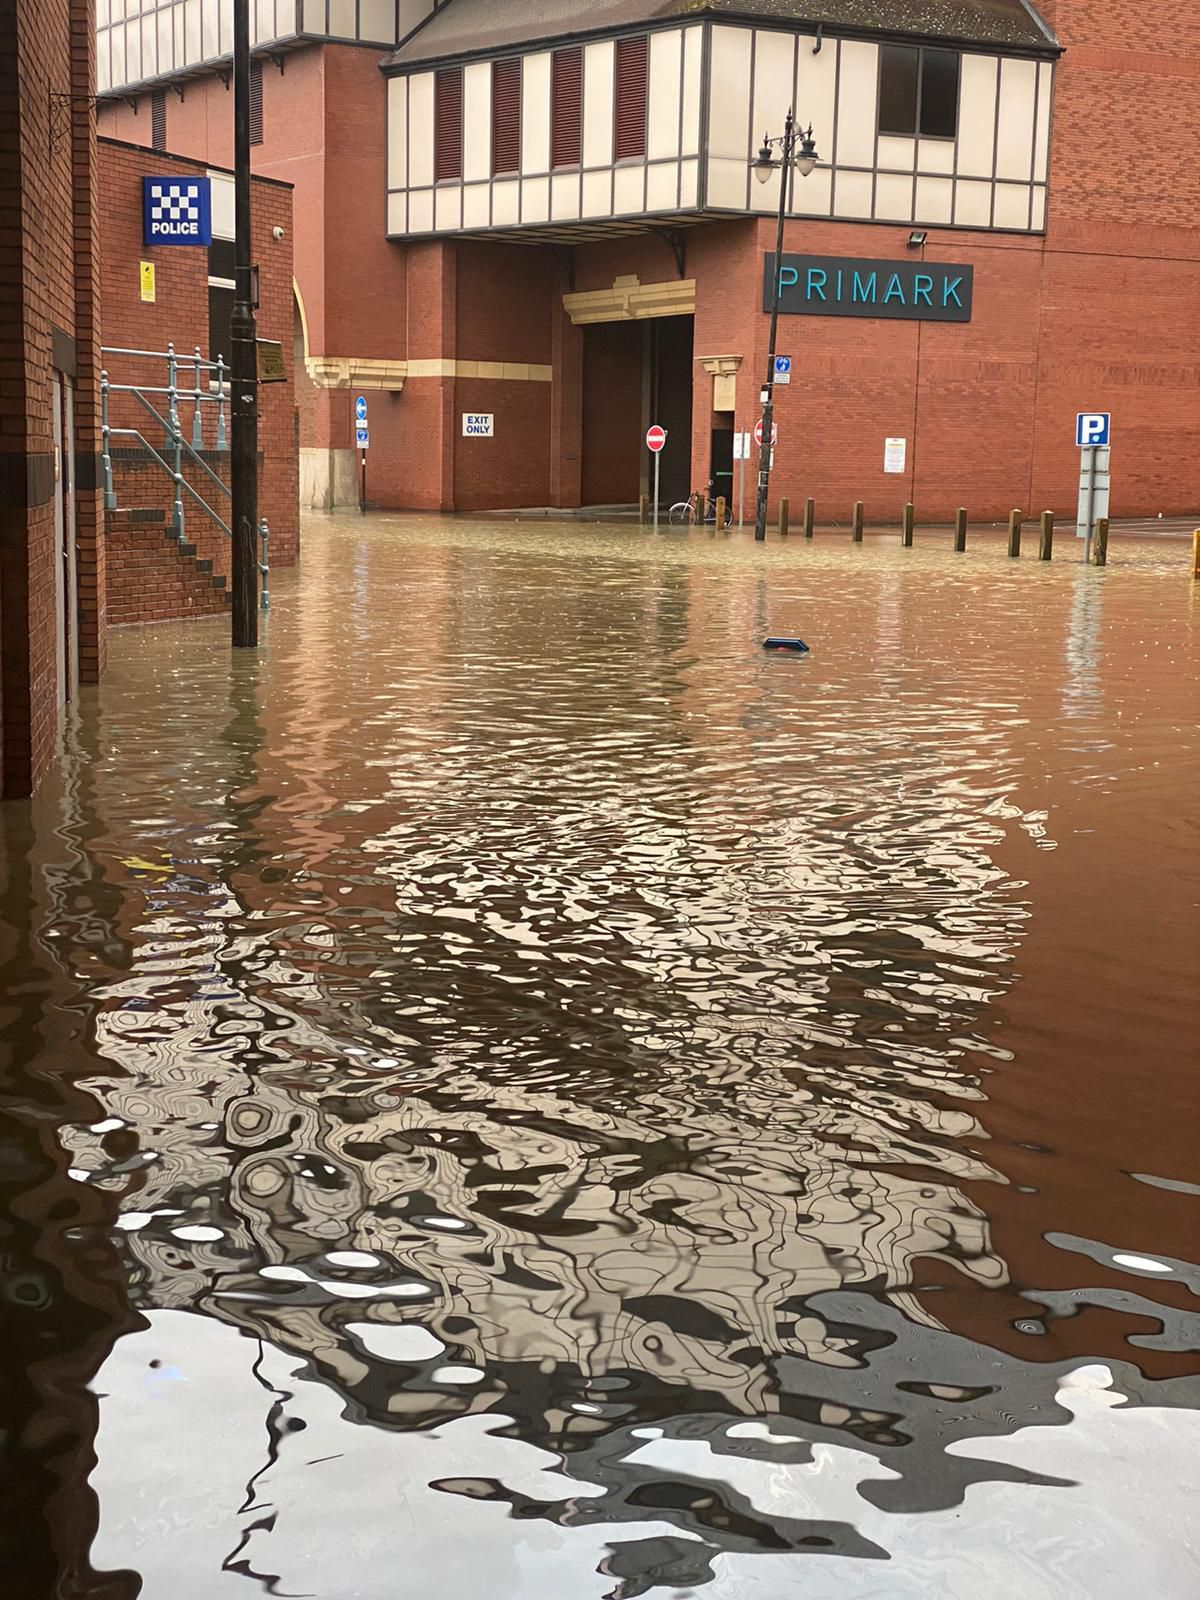 Flooding in Shrewsbury. Photo: @ShrewsburyCops